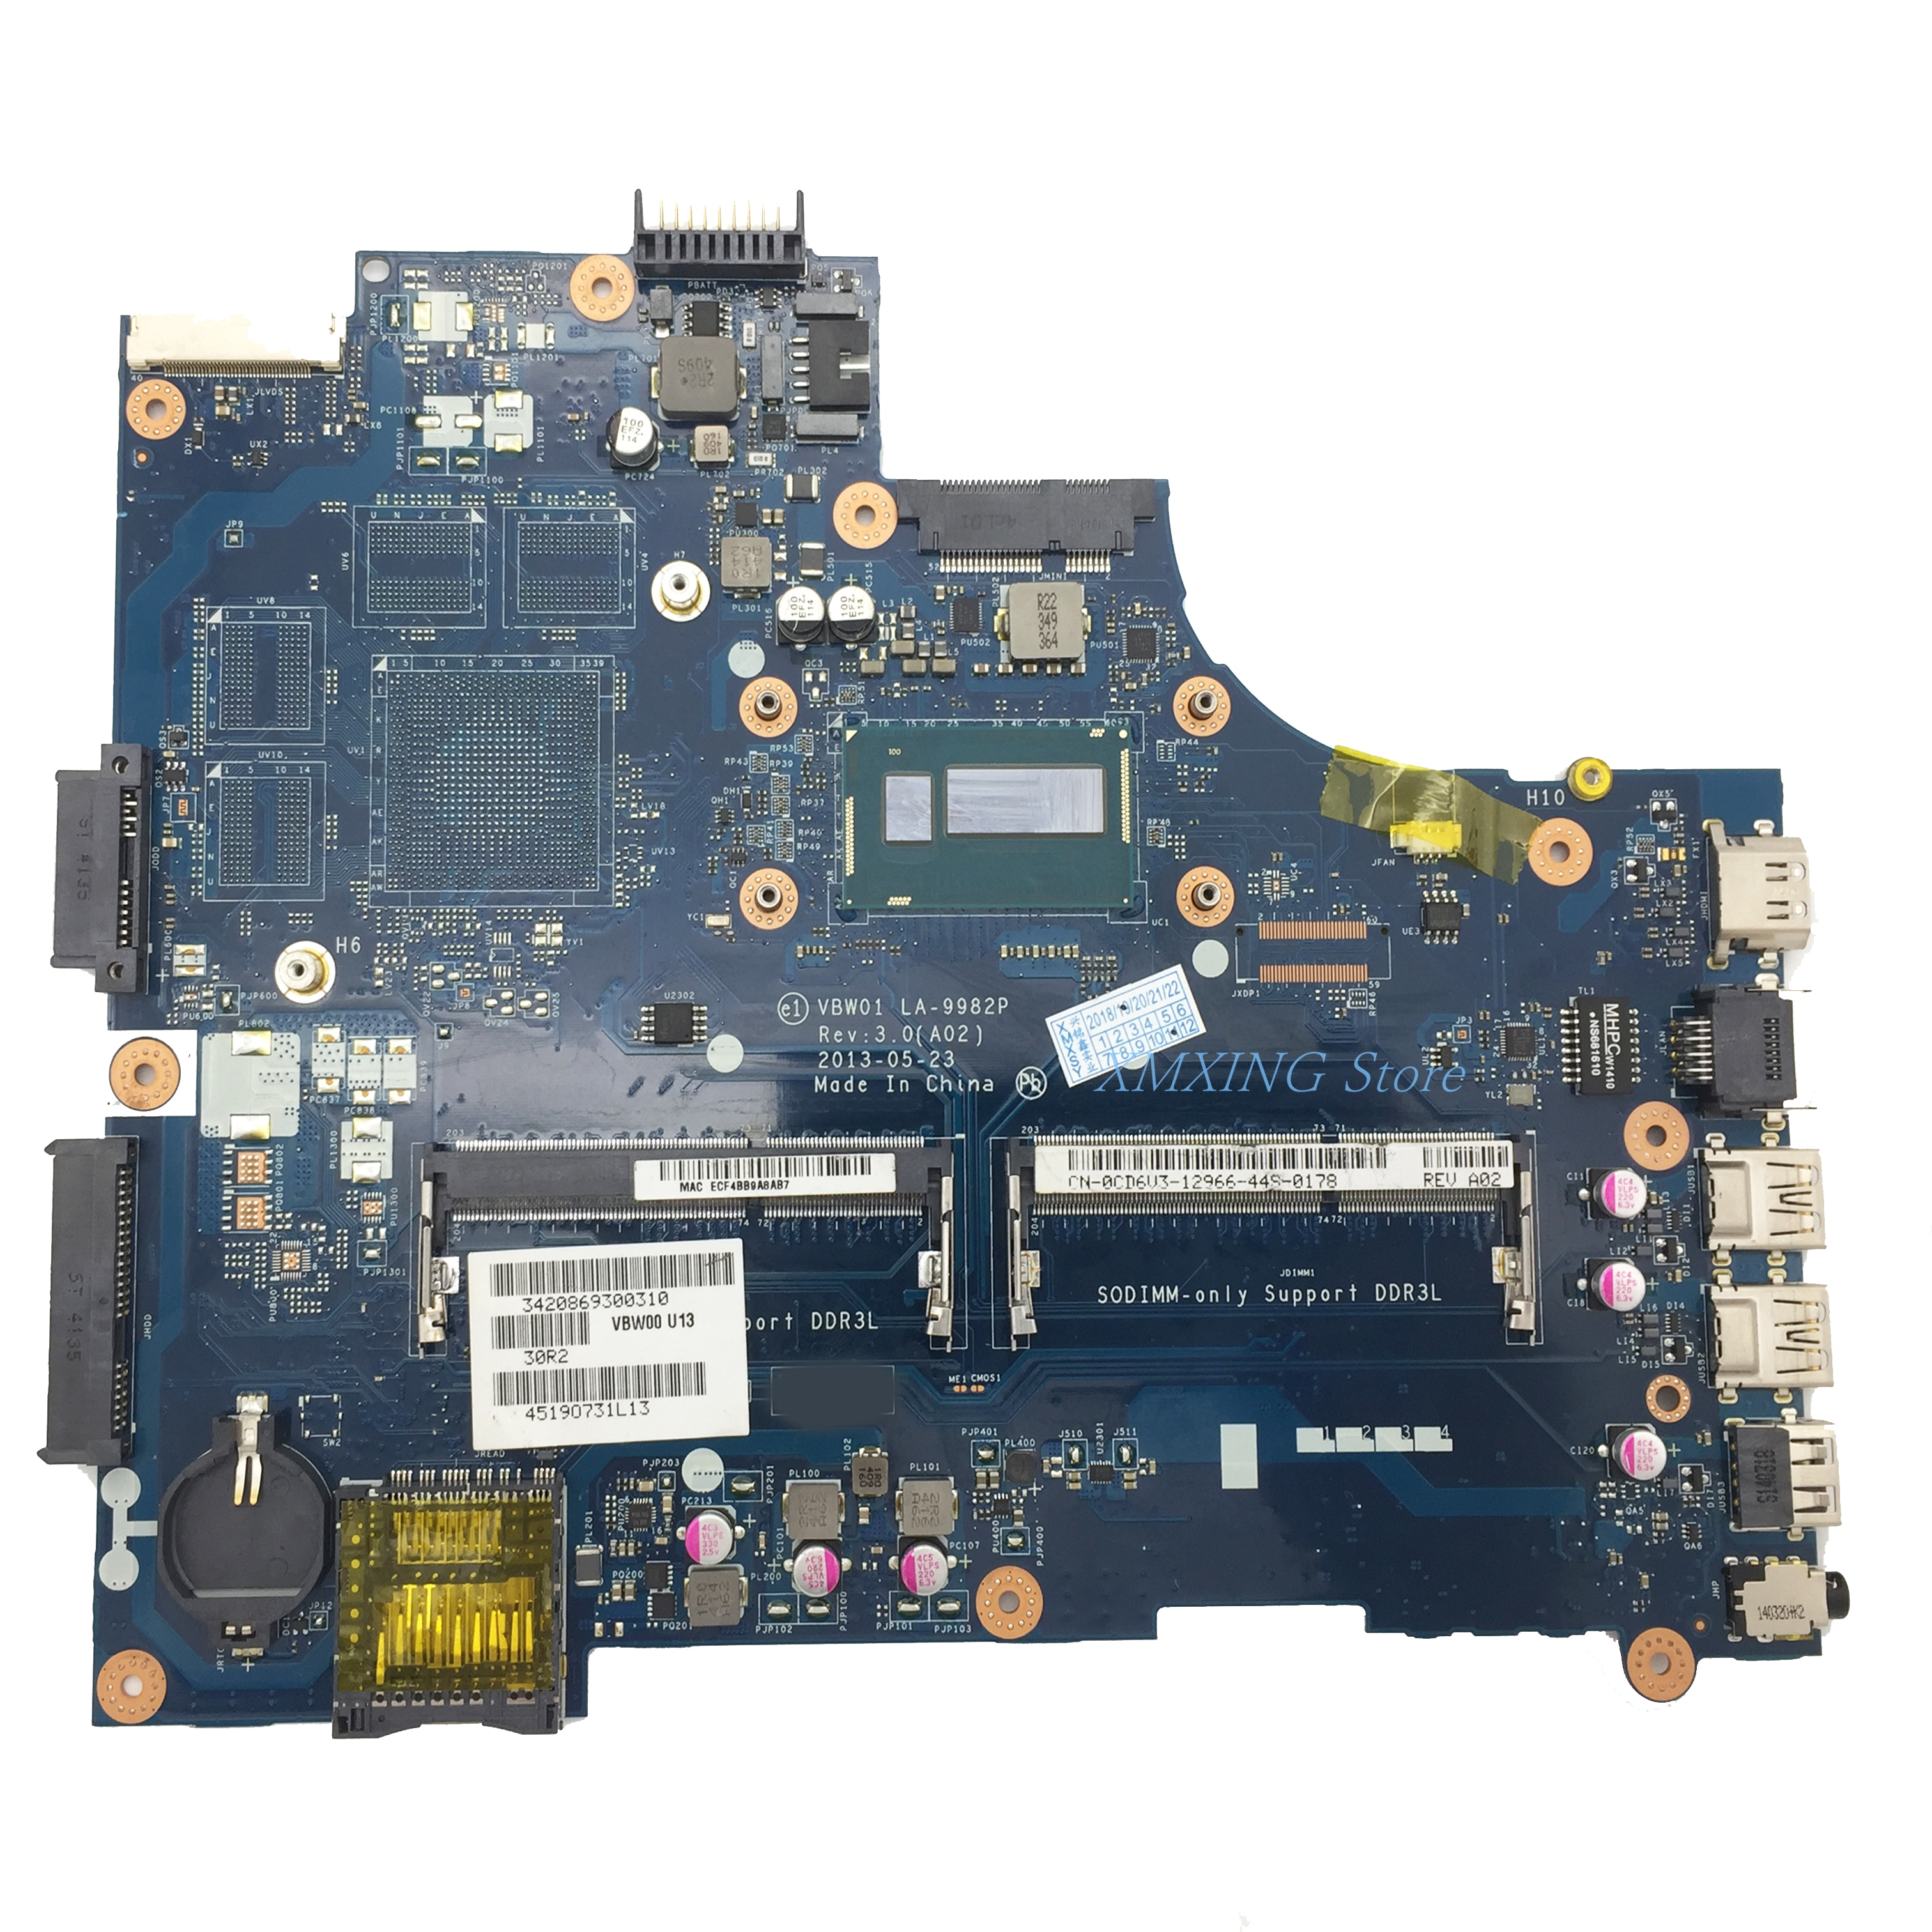 FULCOL لديل خط العرض 15R 5537 3537 اللوحة المحمول I7-4500U CPU LA-9982P CN-0CD6V3 0CD6V3 CD6V3 اختبار 100% العمل